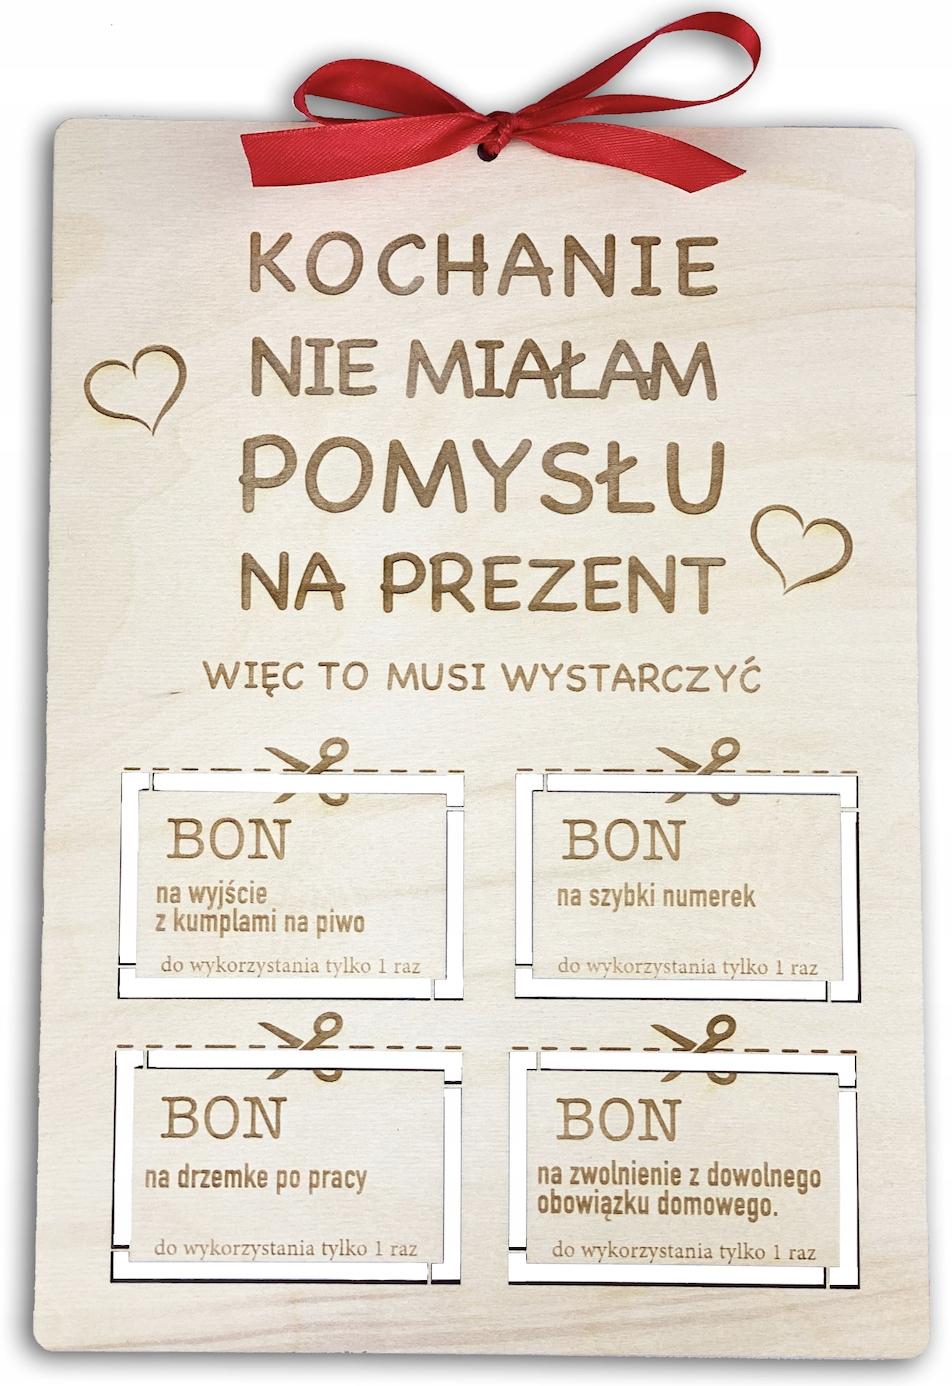 Prezent Na Mikolajki Swieta Zony Meza Bon Kupon 9904384412 Allegro Pl